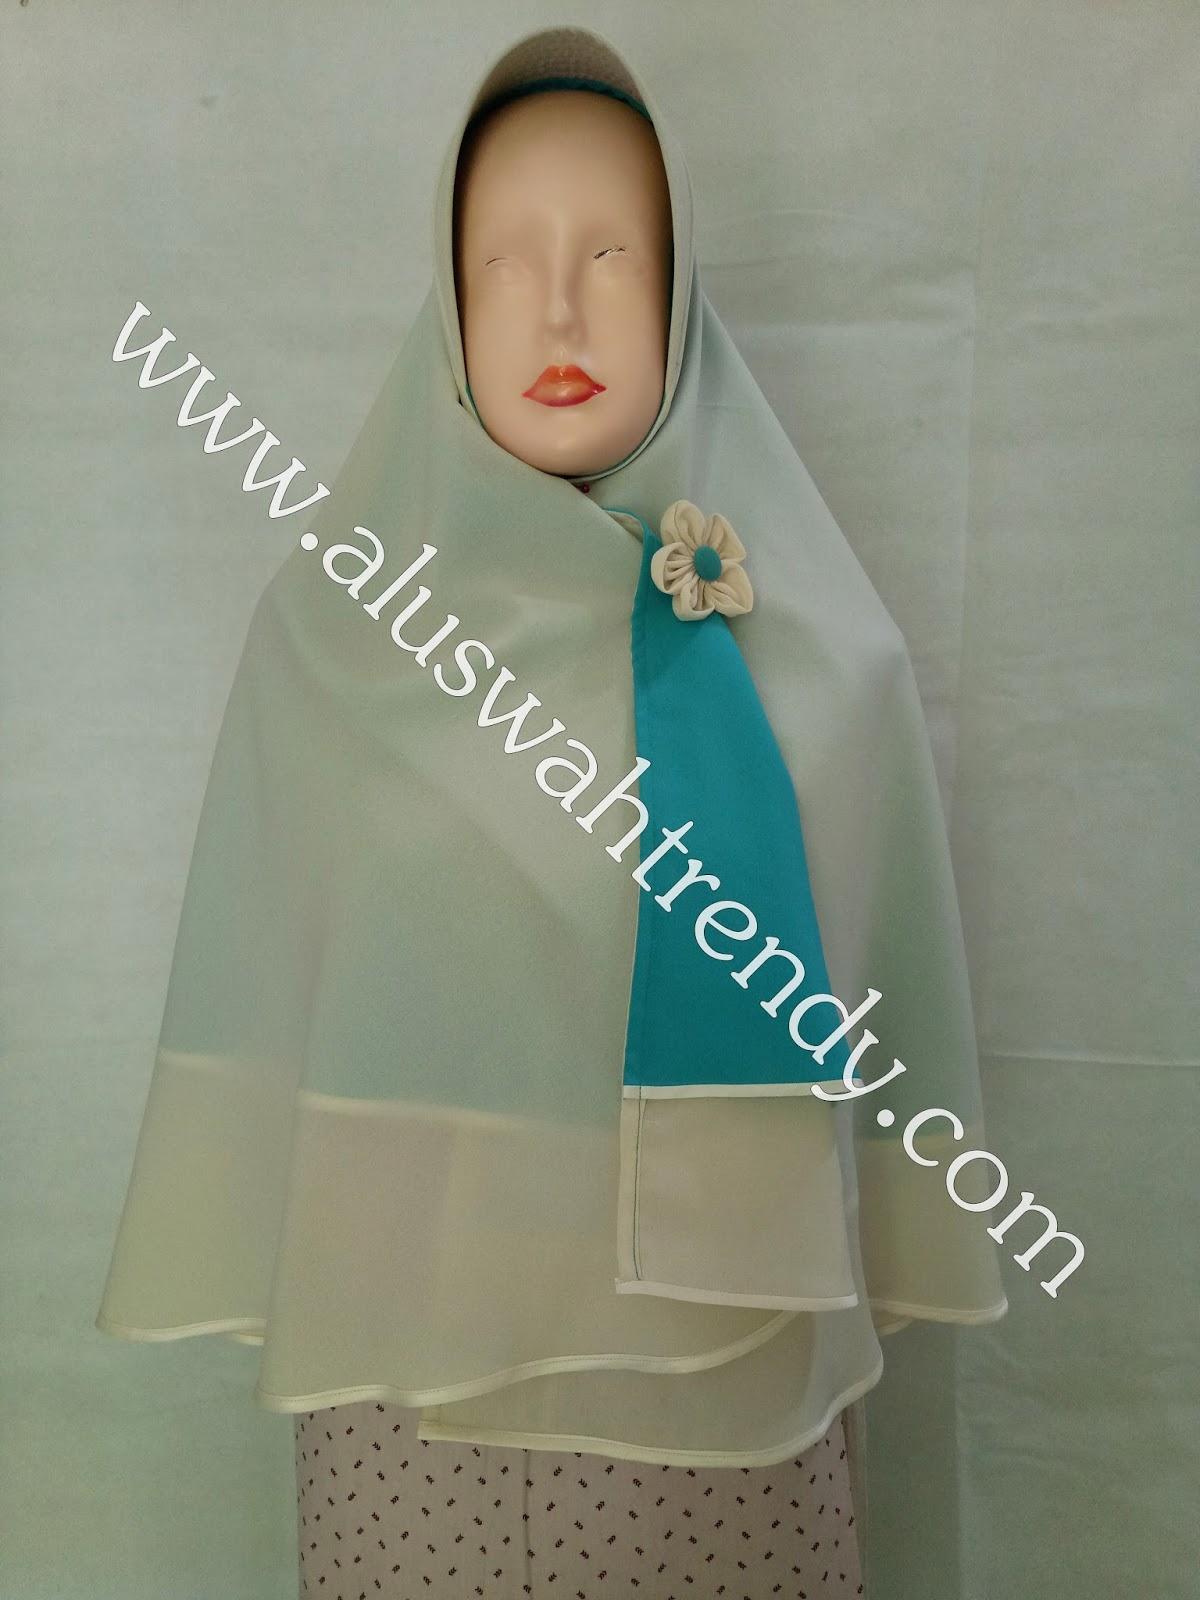 Jilbab Khimar Bolak Balik Dua Warna Putih Tulang-Biru